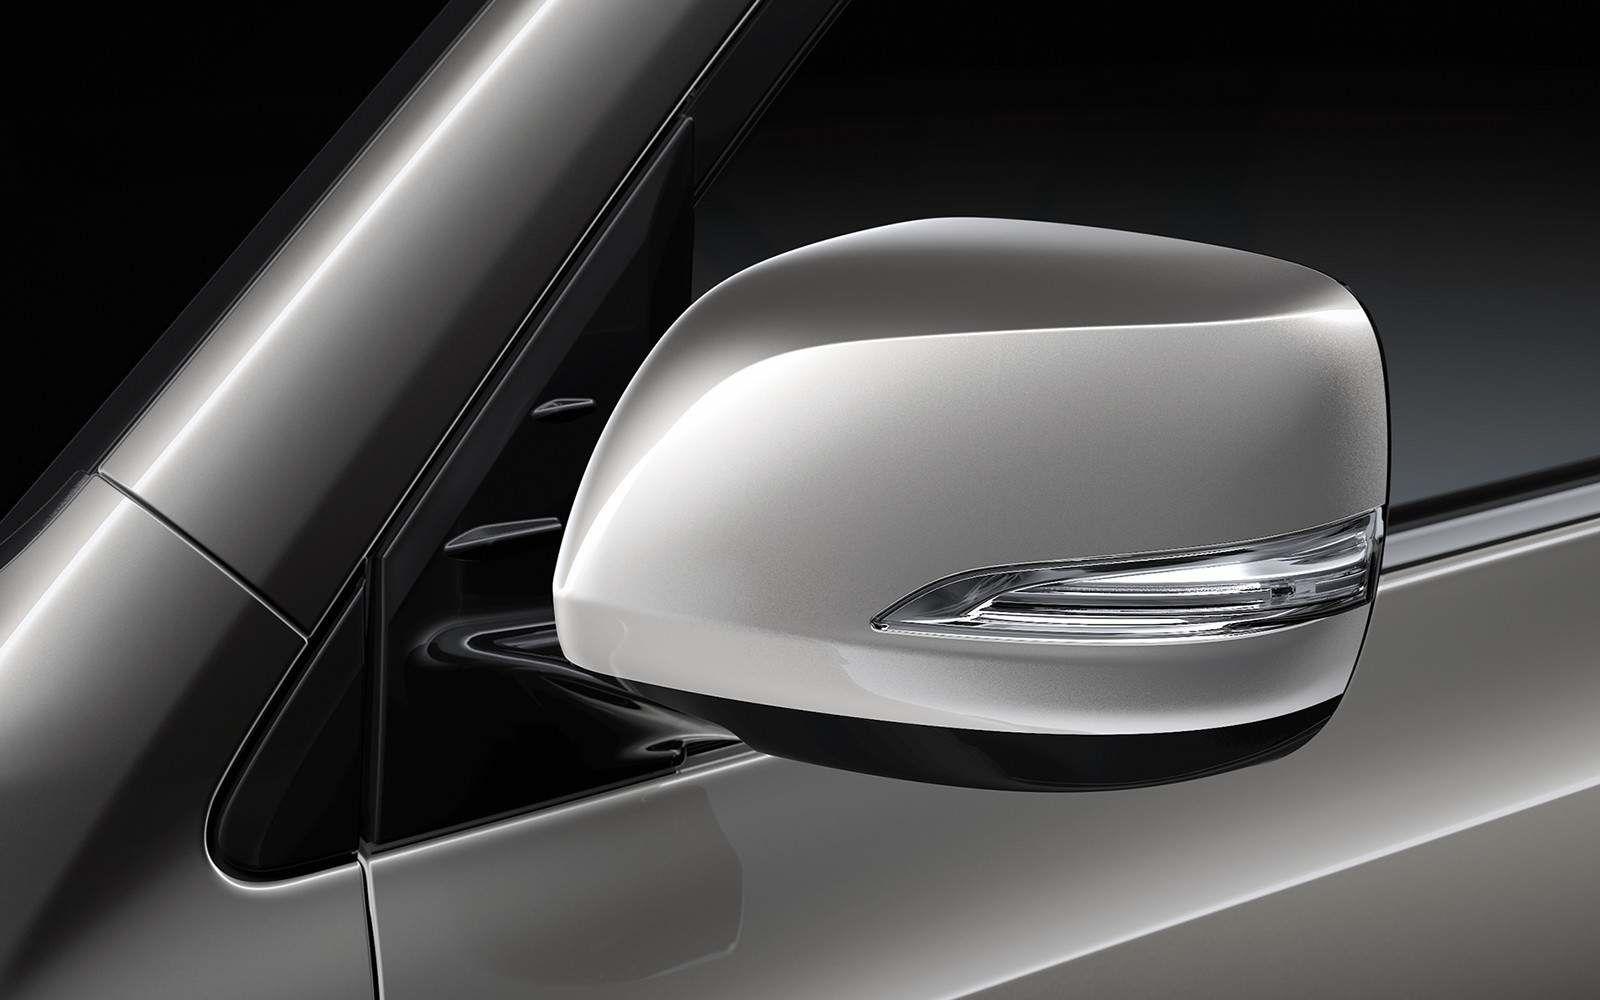 Lexus 2020 Lx 570 Atomic Silver Side Mirror L